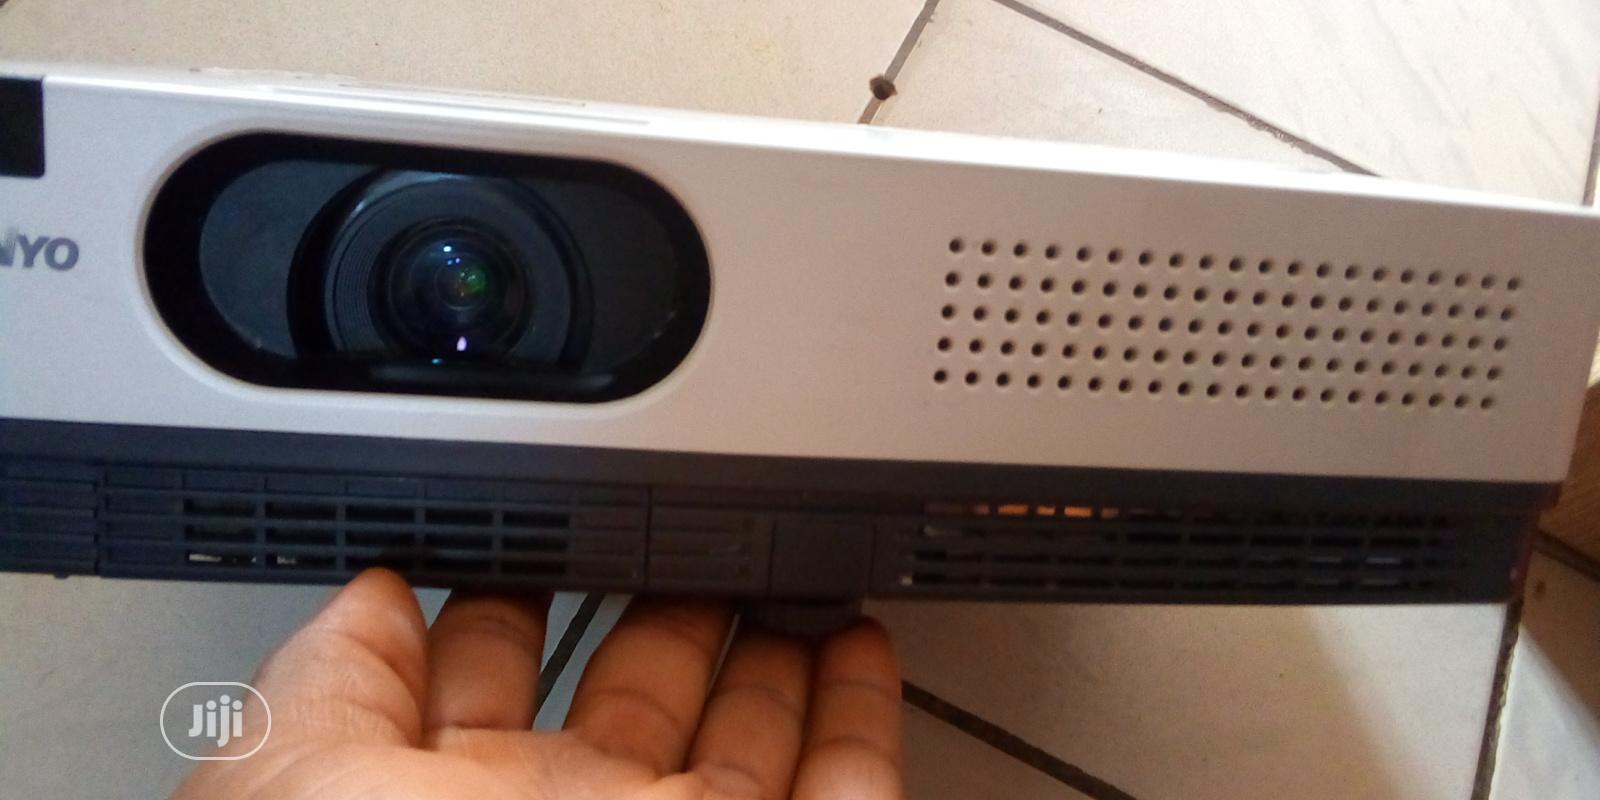 Super Bright Sanyo Projector | TV & DVD Equipment for sale in Abeokuta North, Ogun State, Nigeria